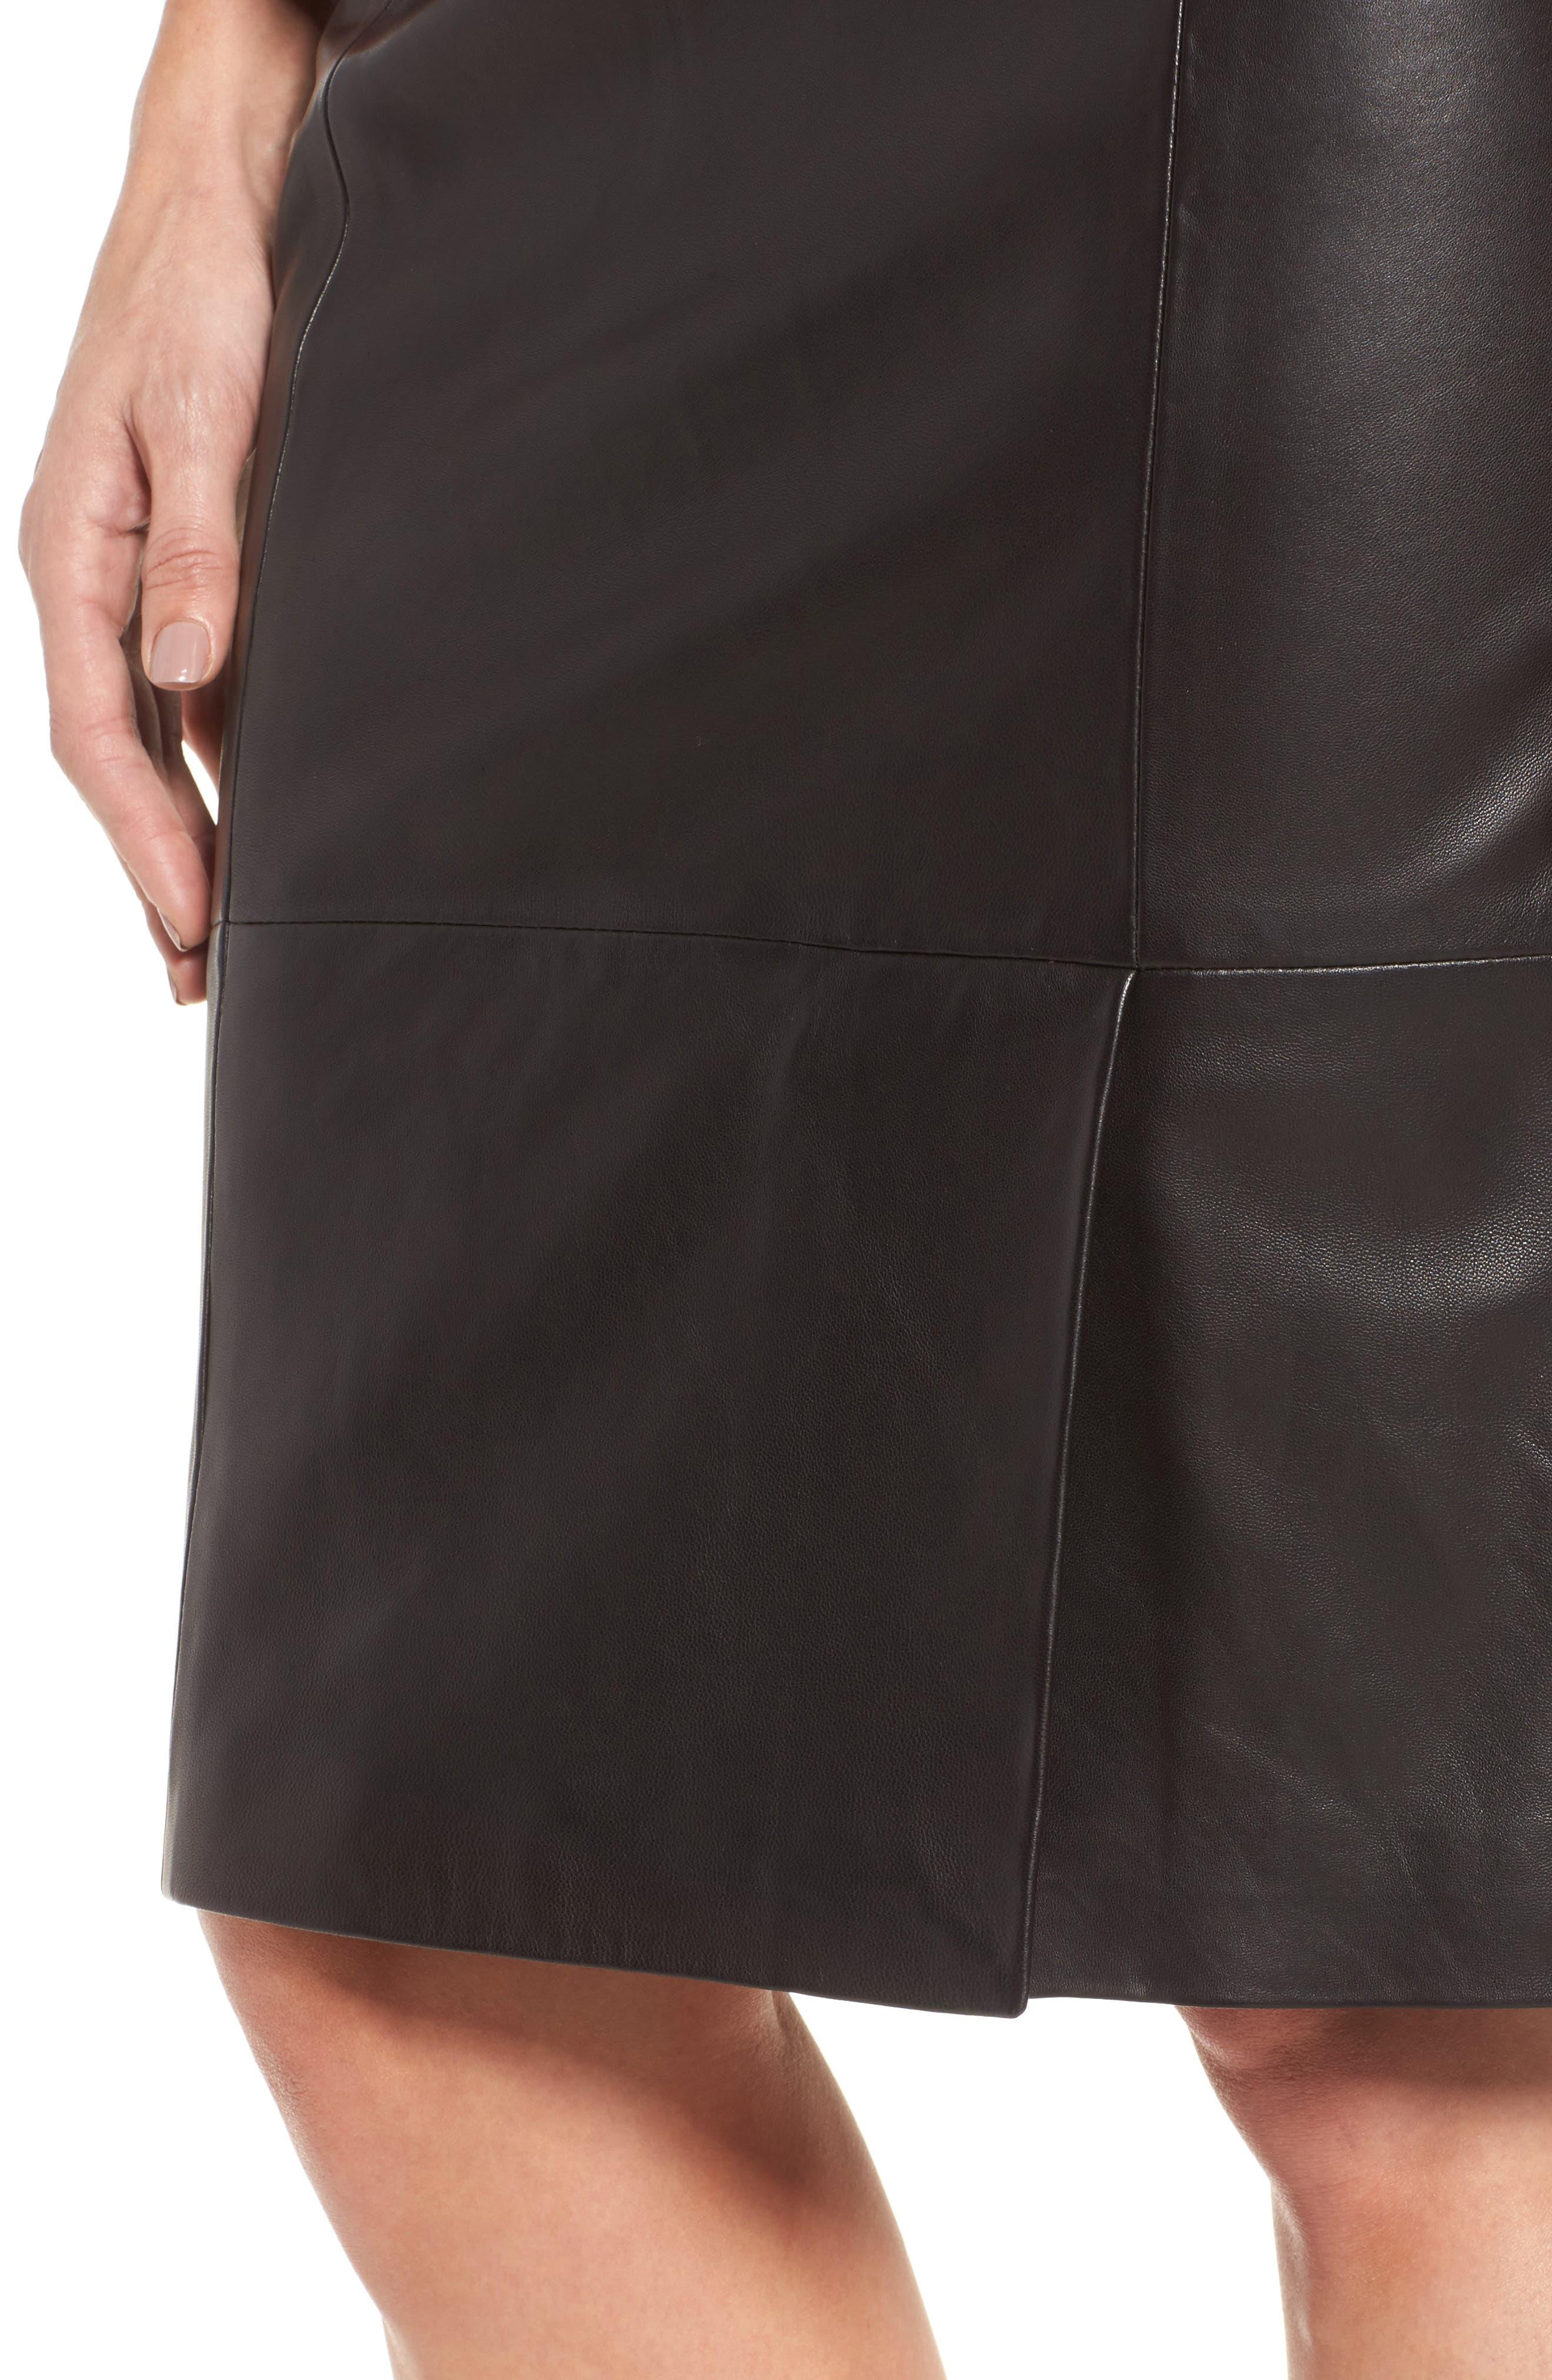 Sepama Leather Pencil Skirt,                             Alternate thumbnail 4, color,                             001